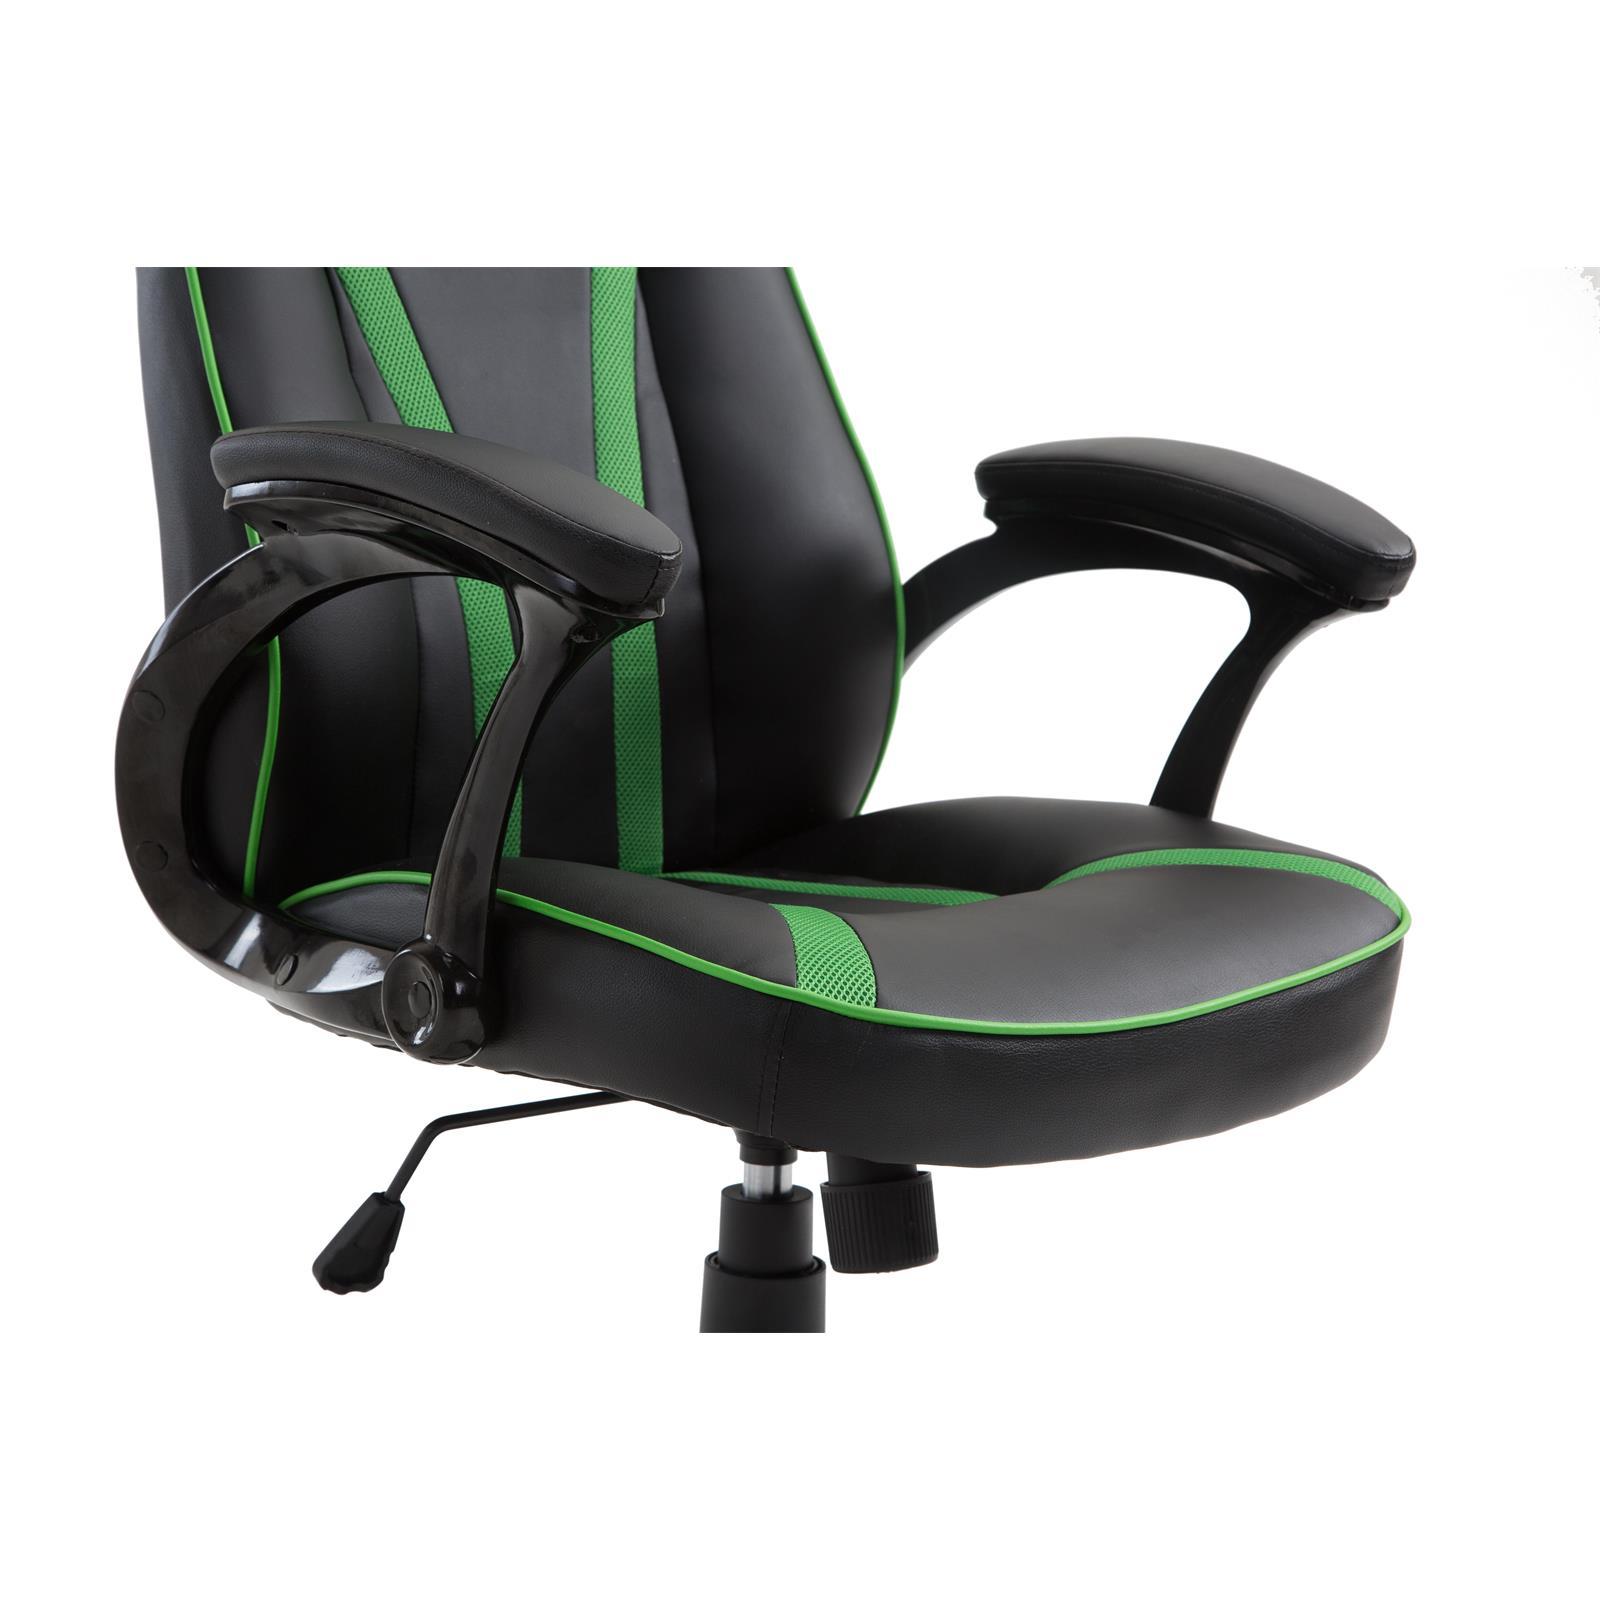 gaming drehstuhl racer racing b rostuhl schreibtischstuhl. Black Bedroom Furniture Sets. Home Design Ideas